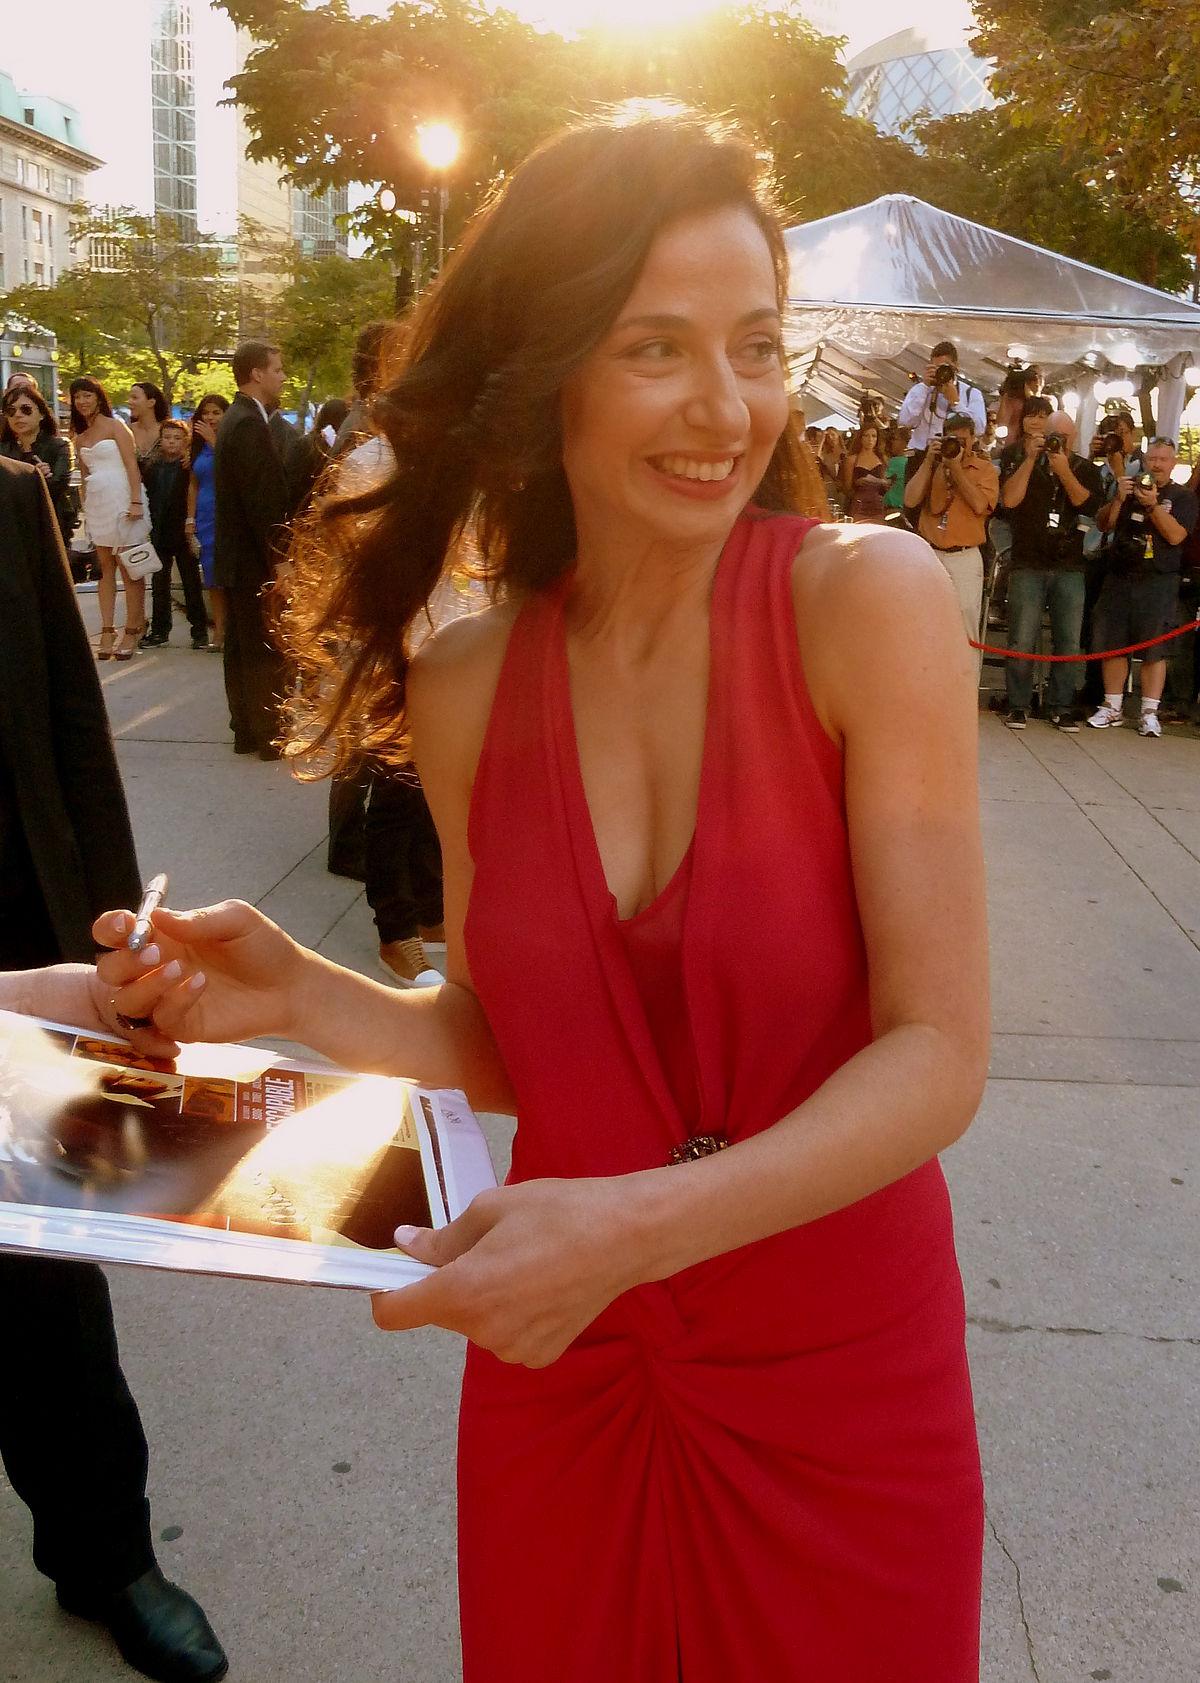 http://upload.wikimedia.org/wikipedia/commons/thumb/9/99/Ruba_Nadda_at_the_premiere_of_Inescapable%2C_Toronto_Film_Festival_2012_%281%29.jpg/1200px-Ruba_Nadda_at_the_premiere_of_Inescapable%2C_Toronto_Film_Festival_2012_%281%29.jpg